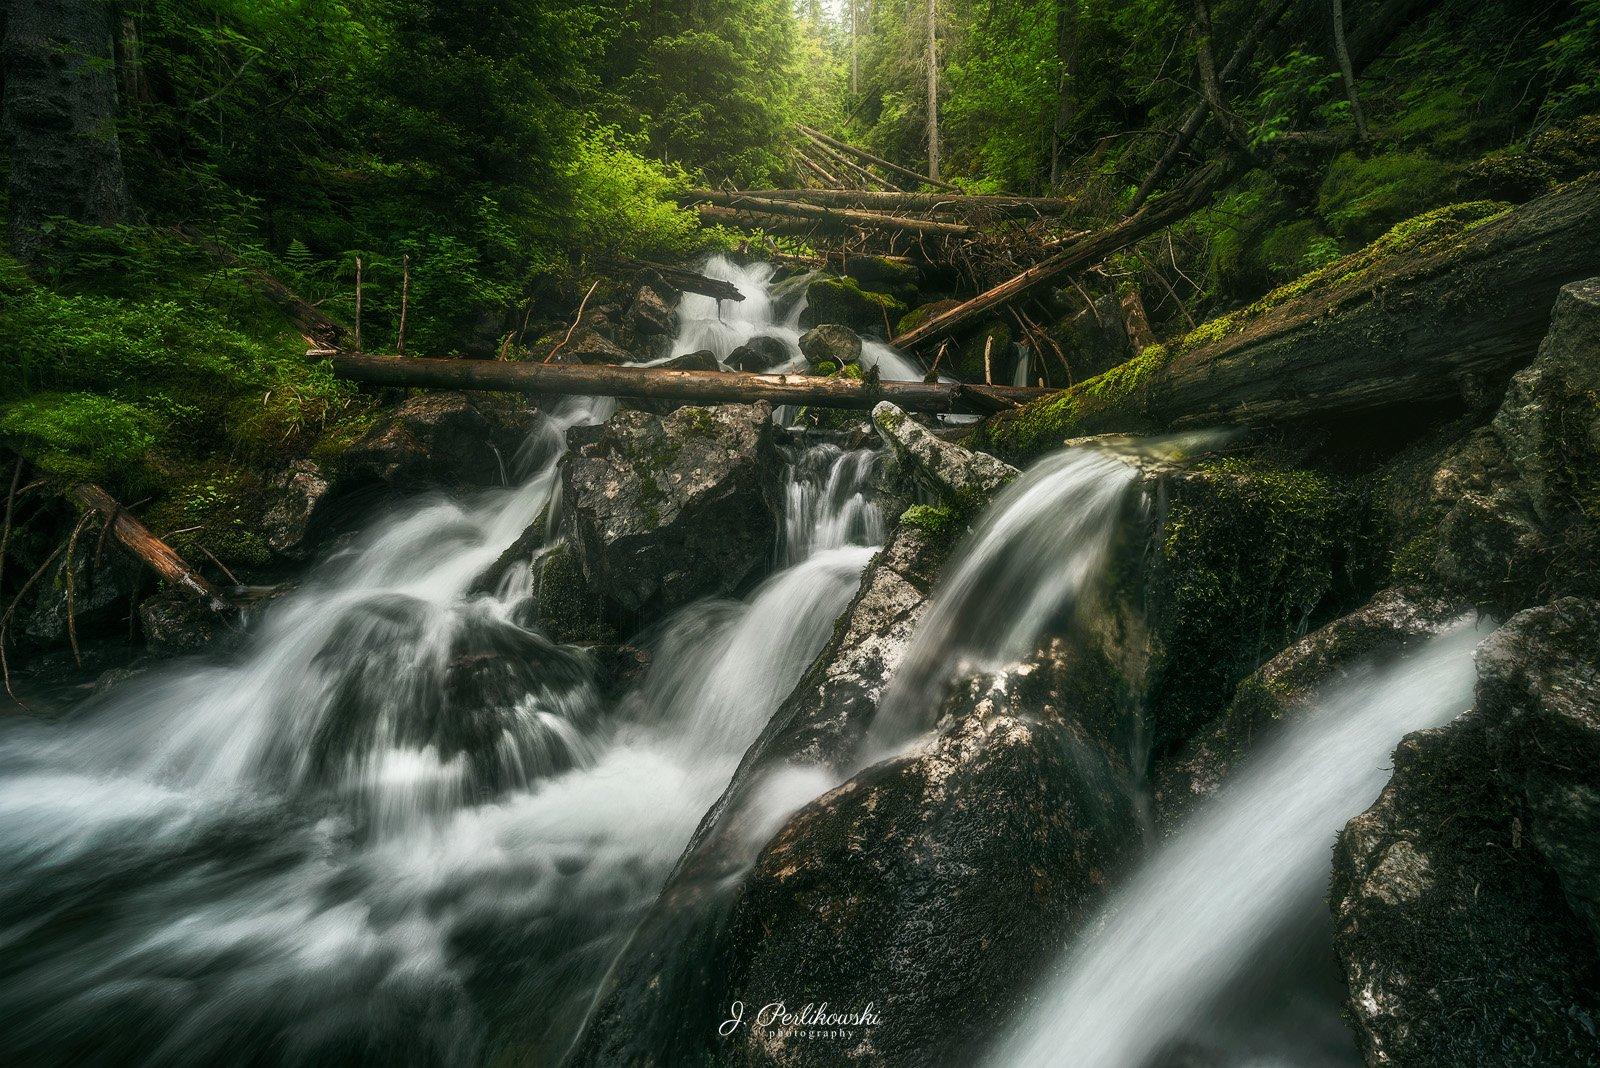 tatra mountains, tatras, tatry, creek, waterfall, water, river, mountain,, Perlikowski Jakub